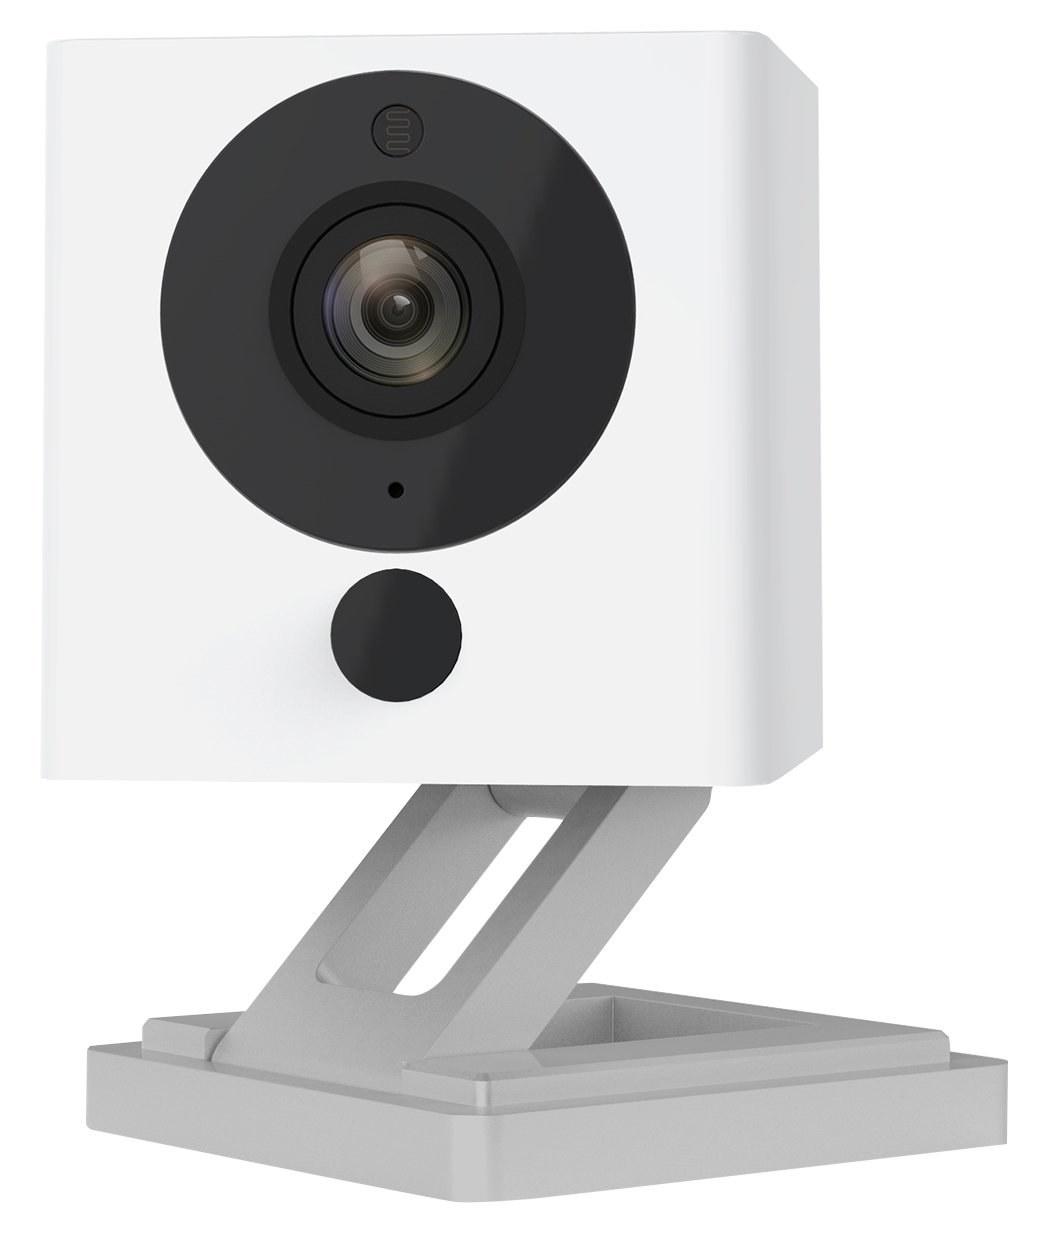 Closeup of the square wireless camera